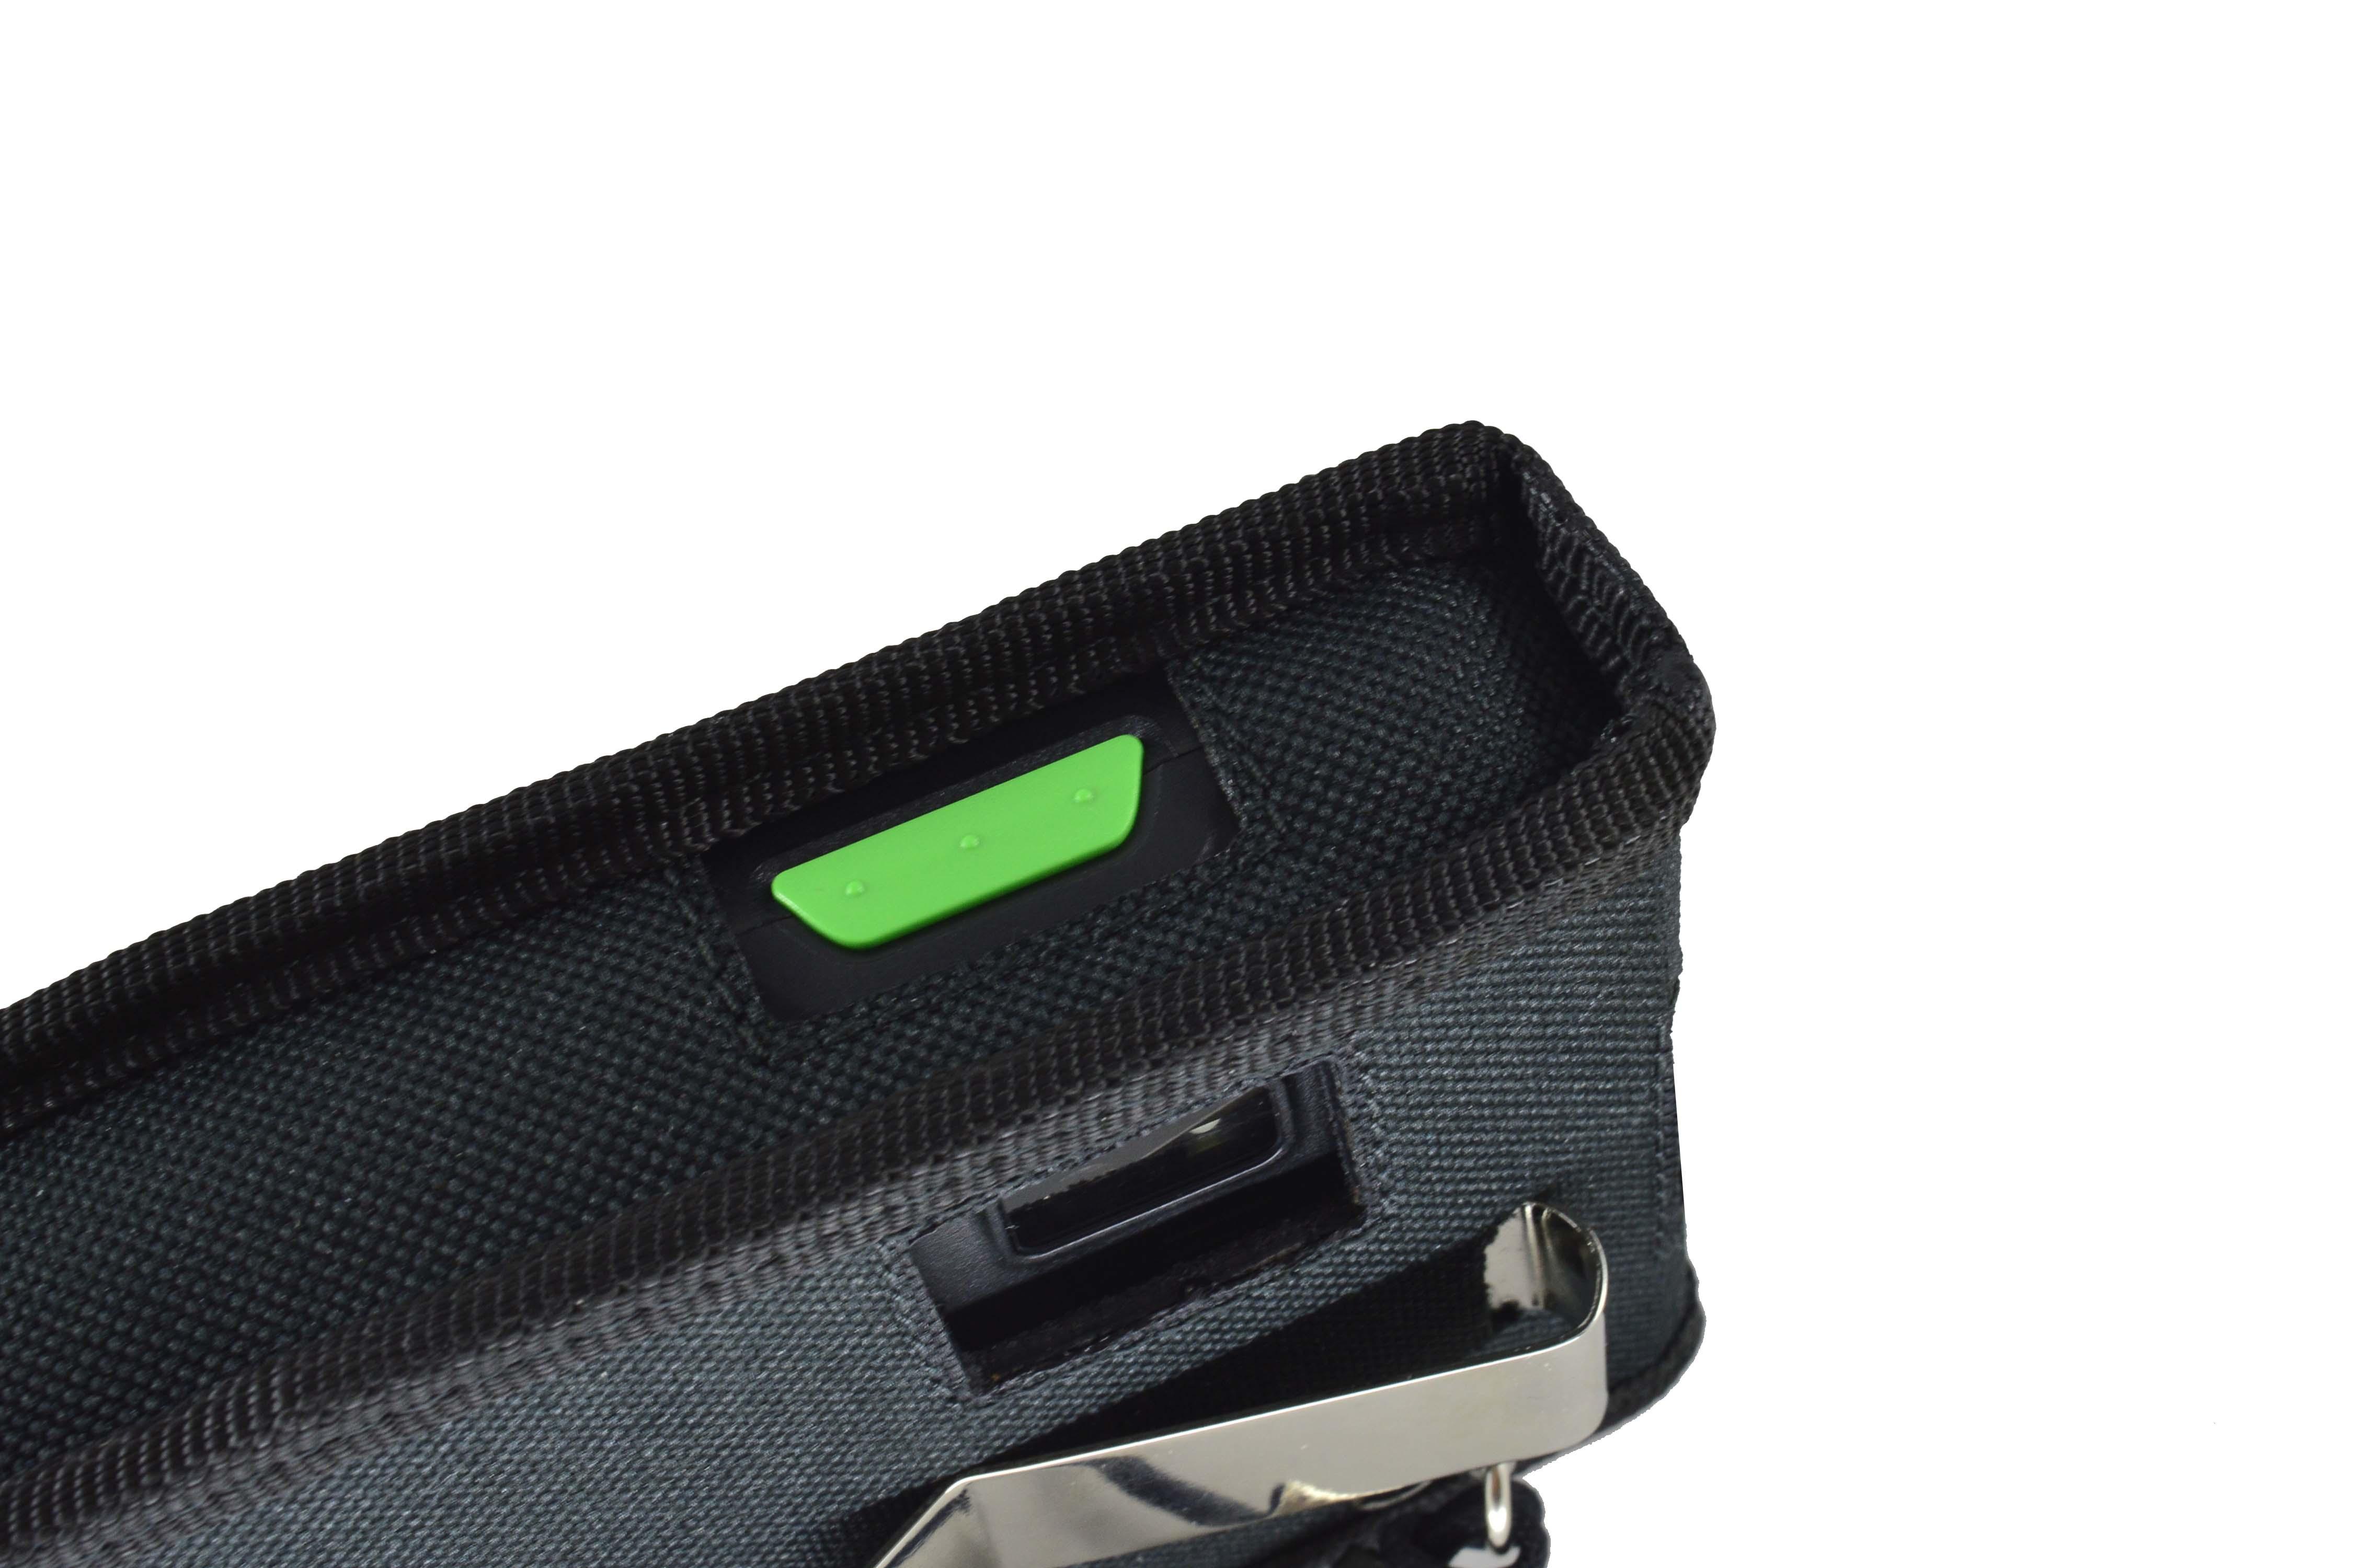 Honeywell ScanPal EDA 50K case right side detail